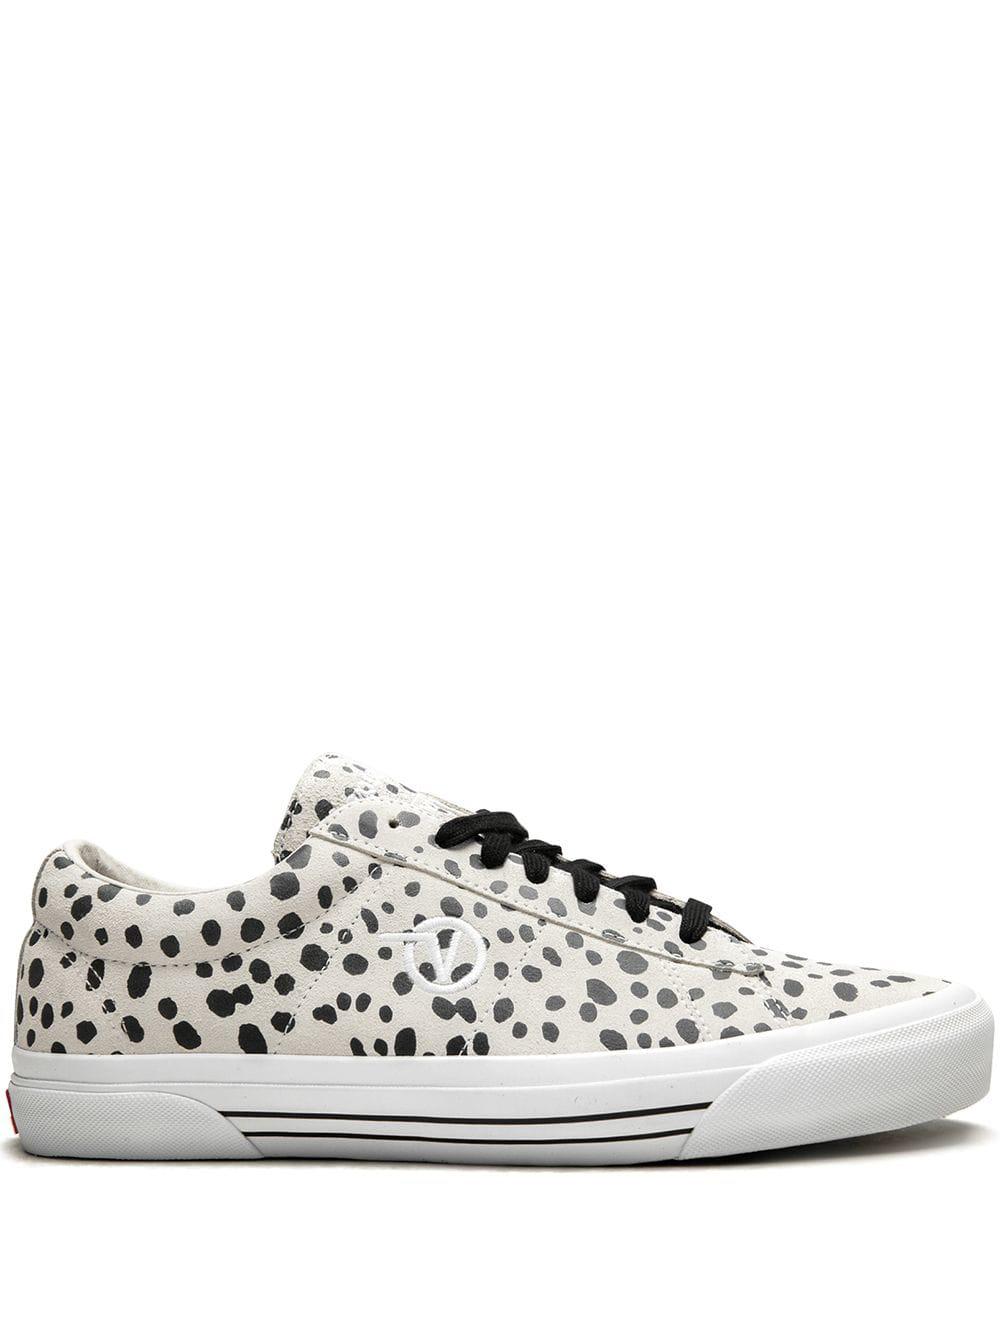 685dcf908b85 Vans Sid Pro Sneakers - White